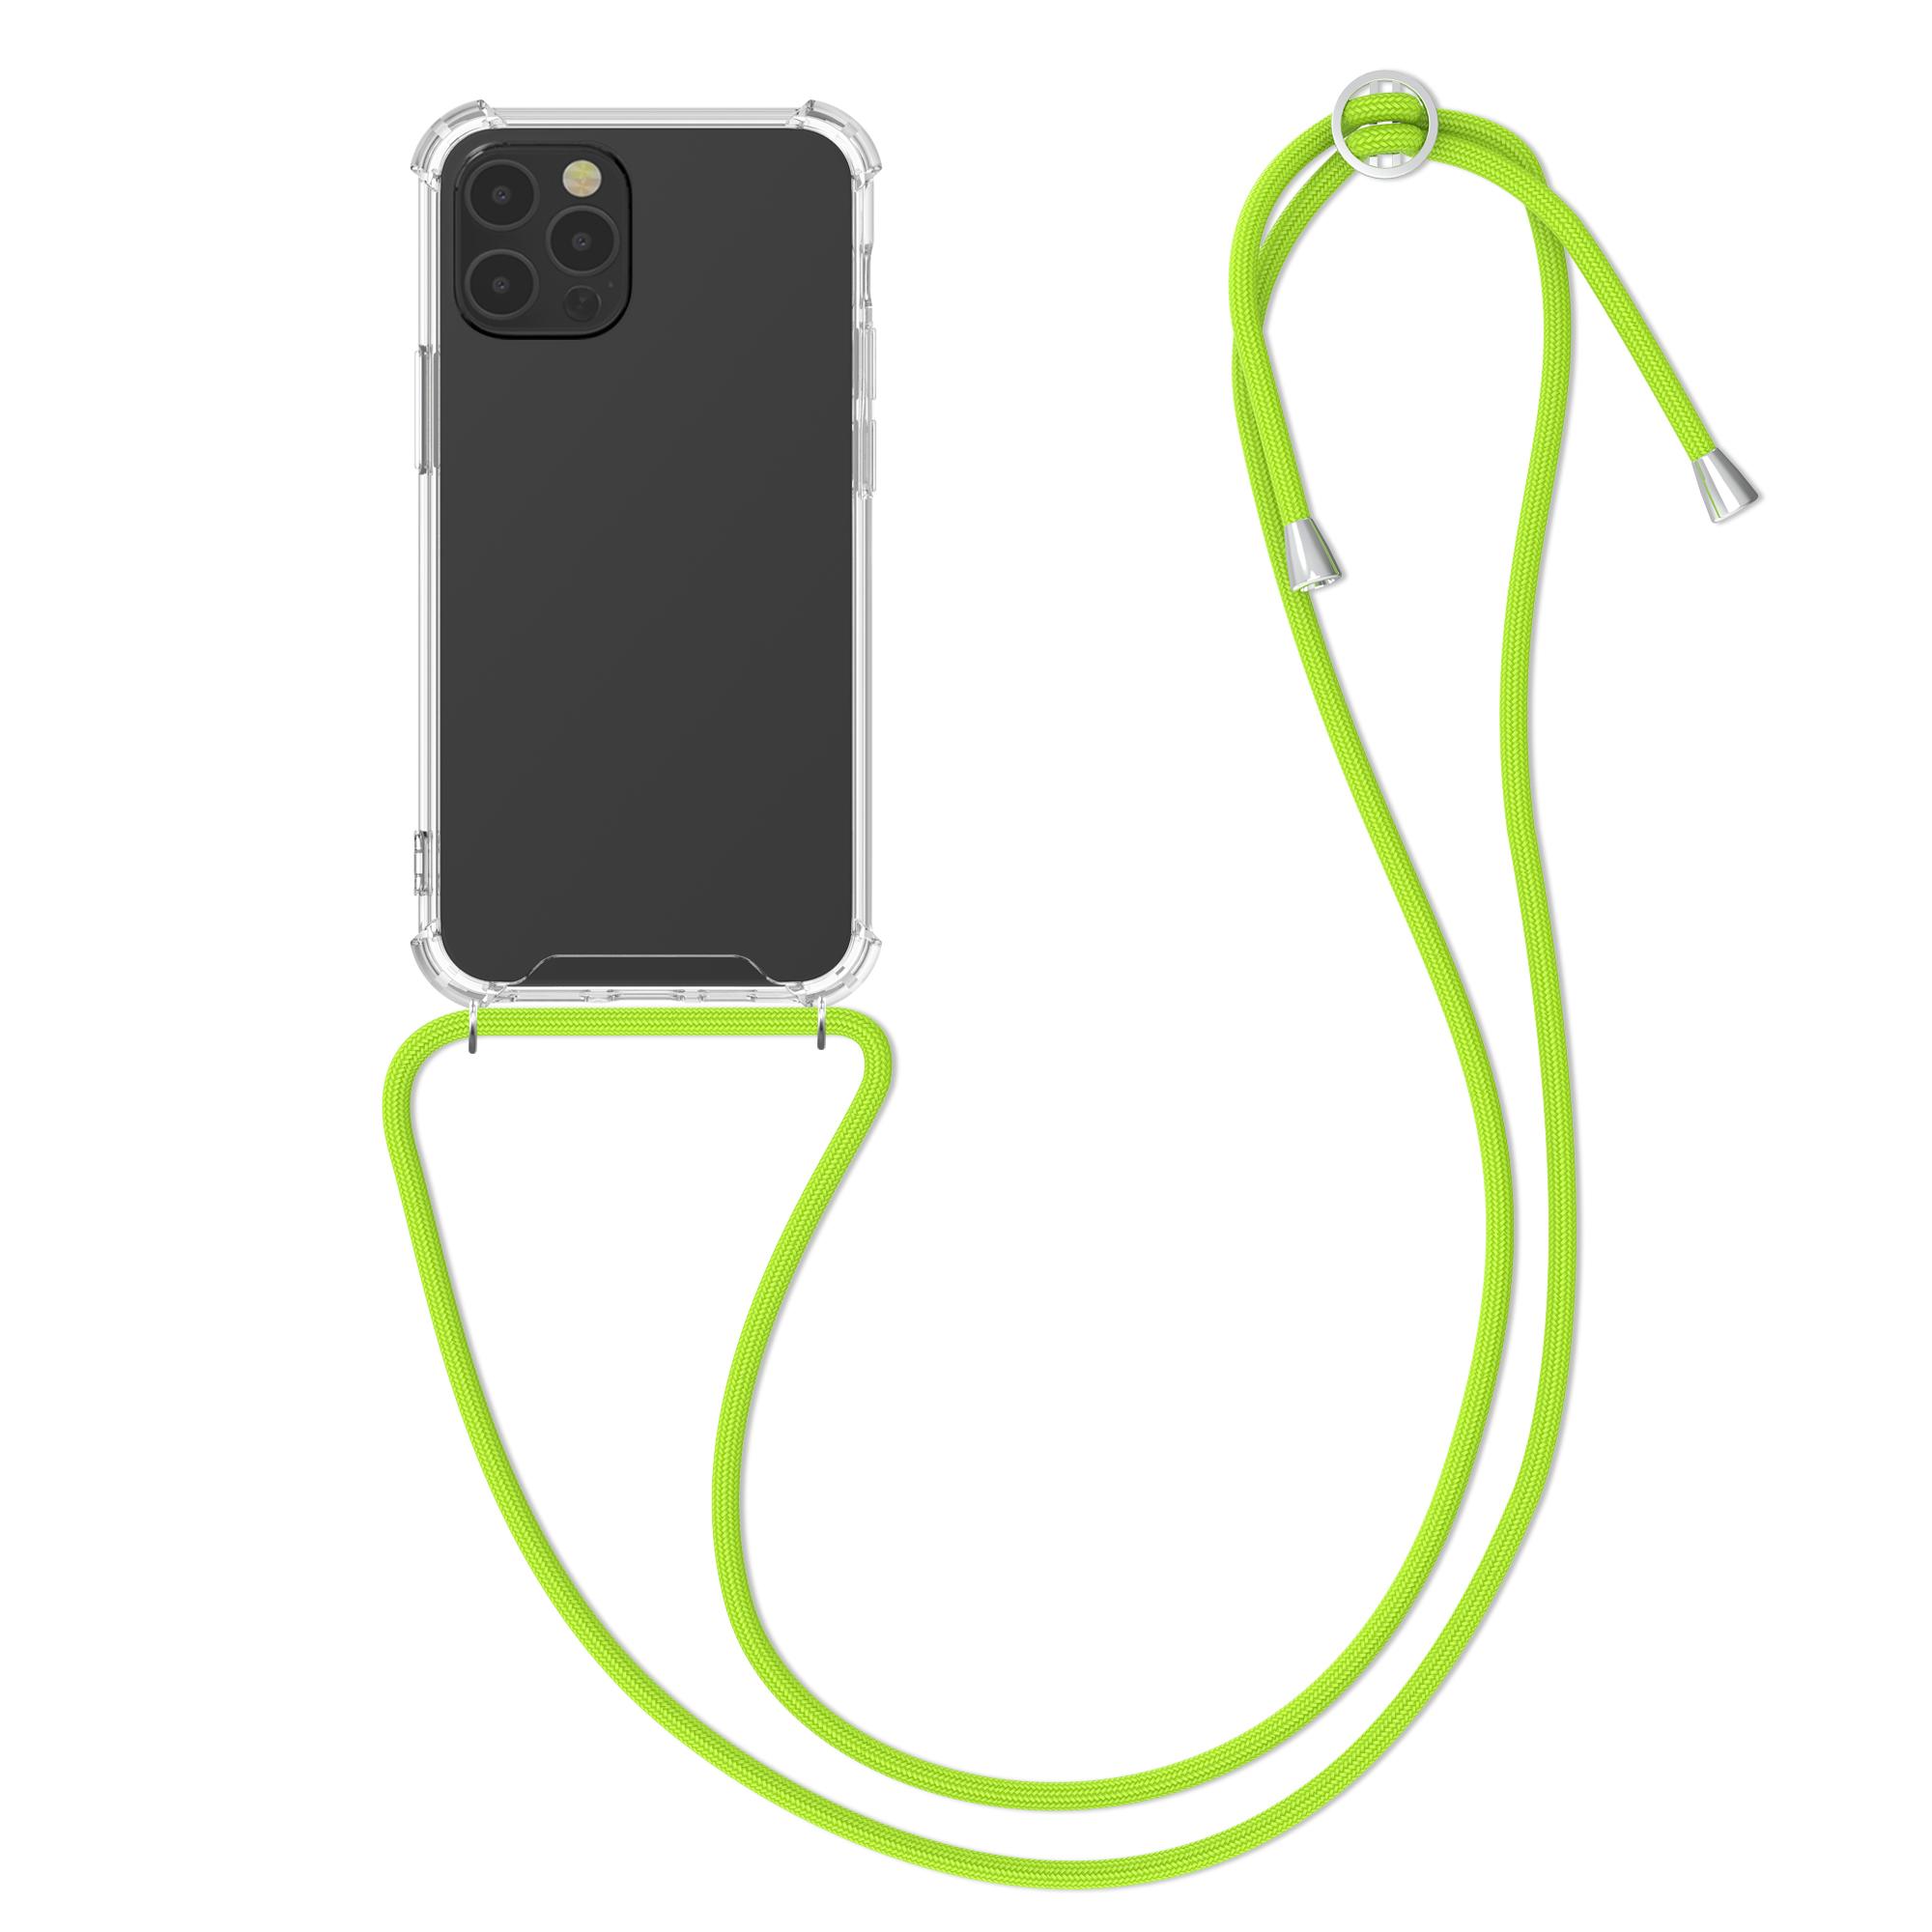 Kvalitní silikonové TPU pouzdro pro Apple iPhone 12 / 12 Pro - Transparent | Neon Green